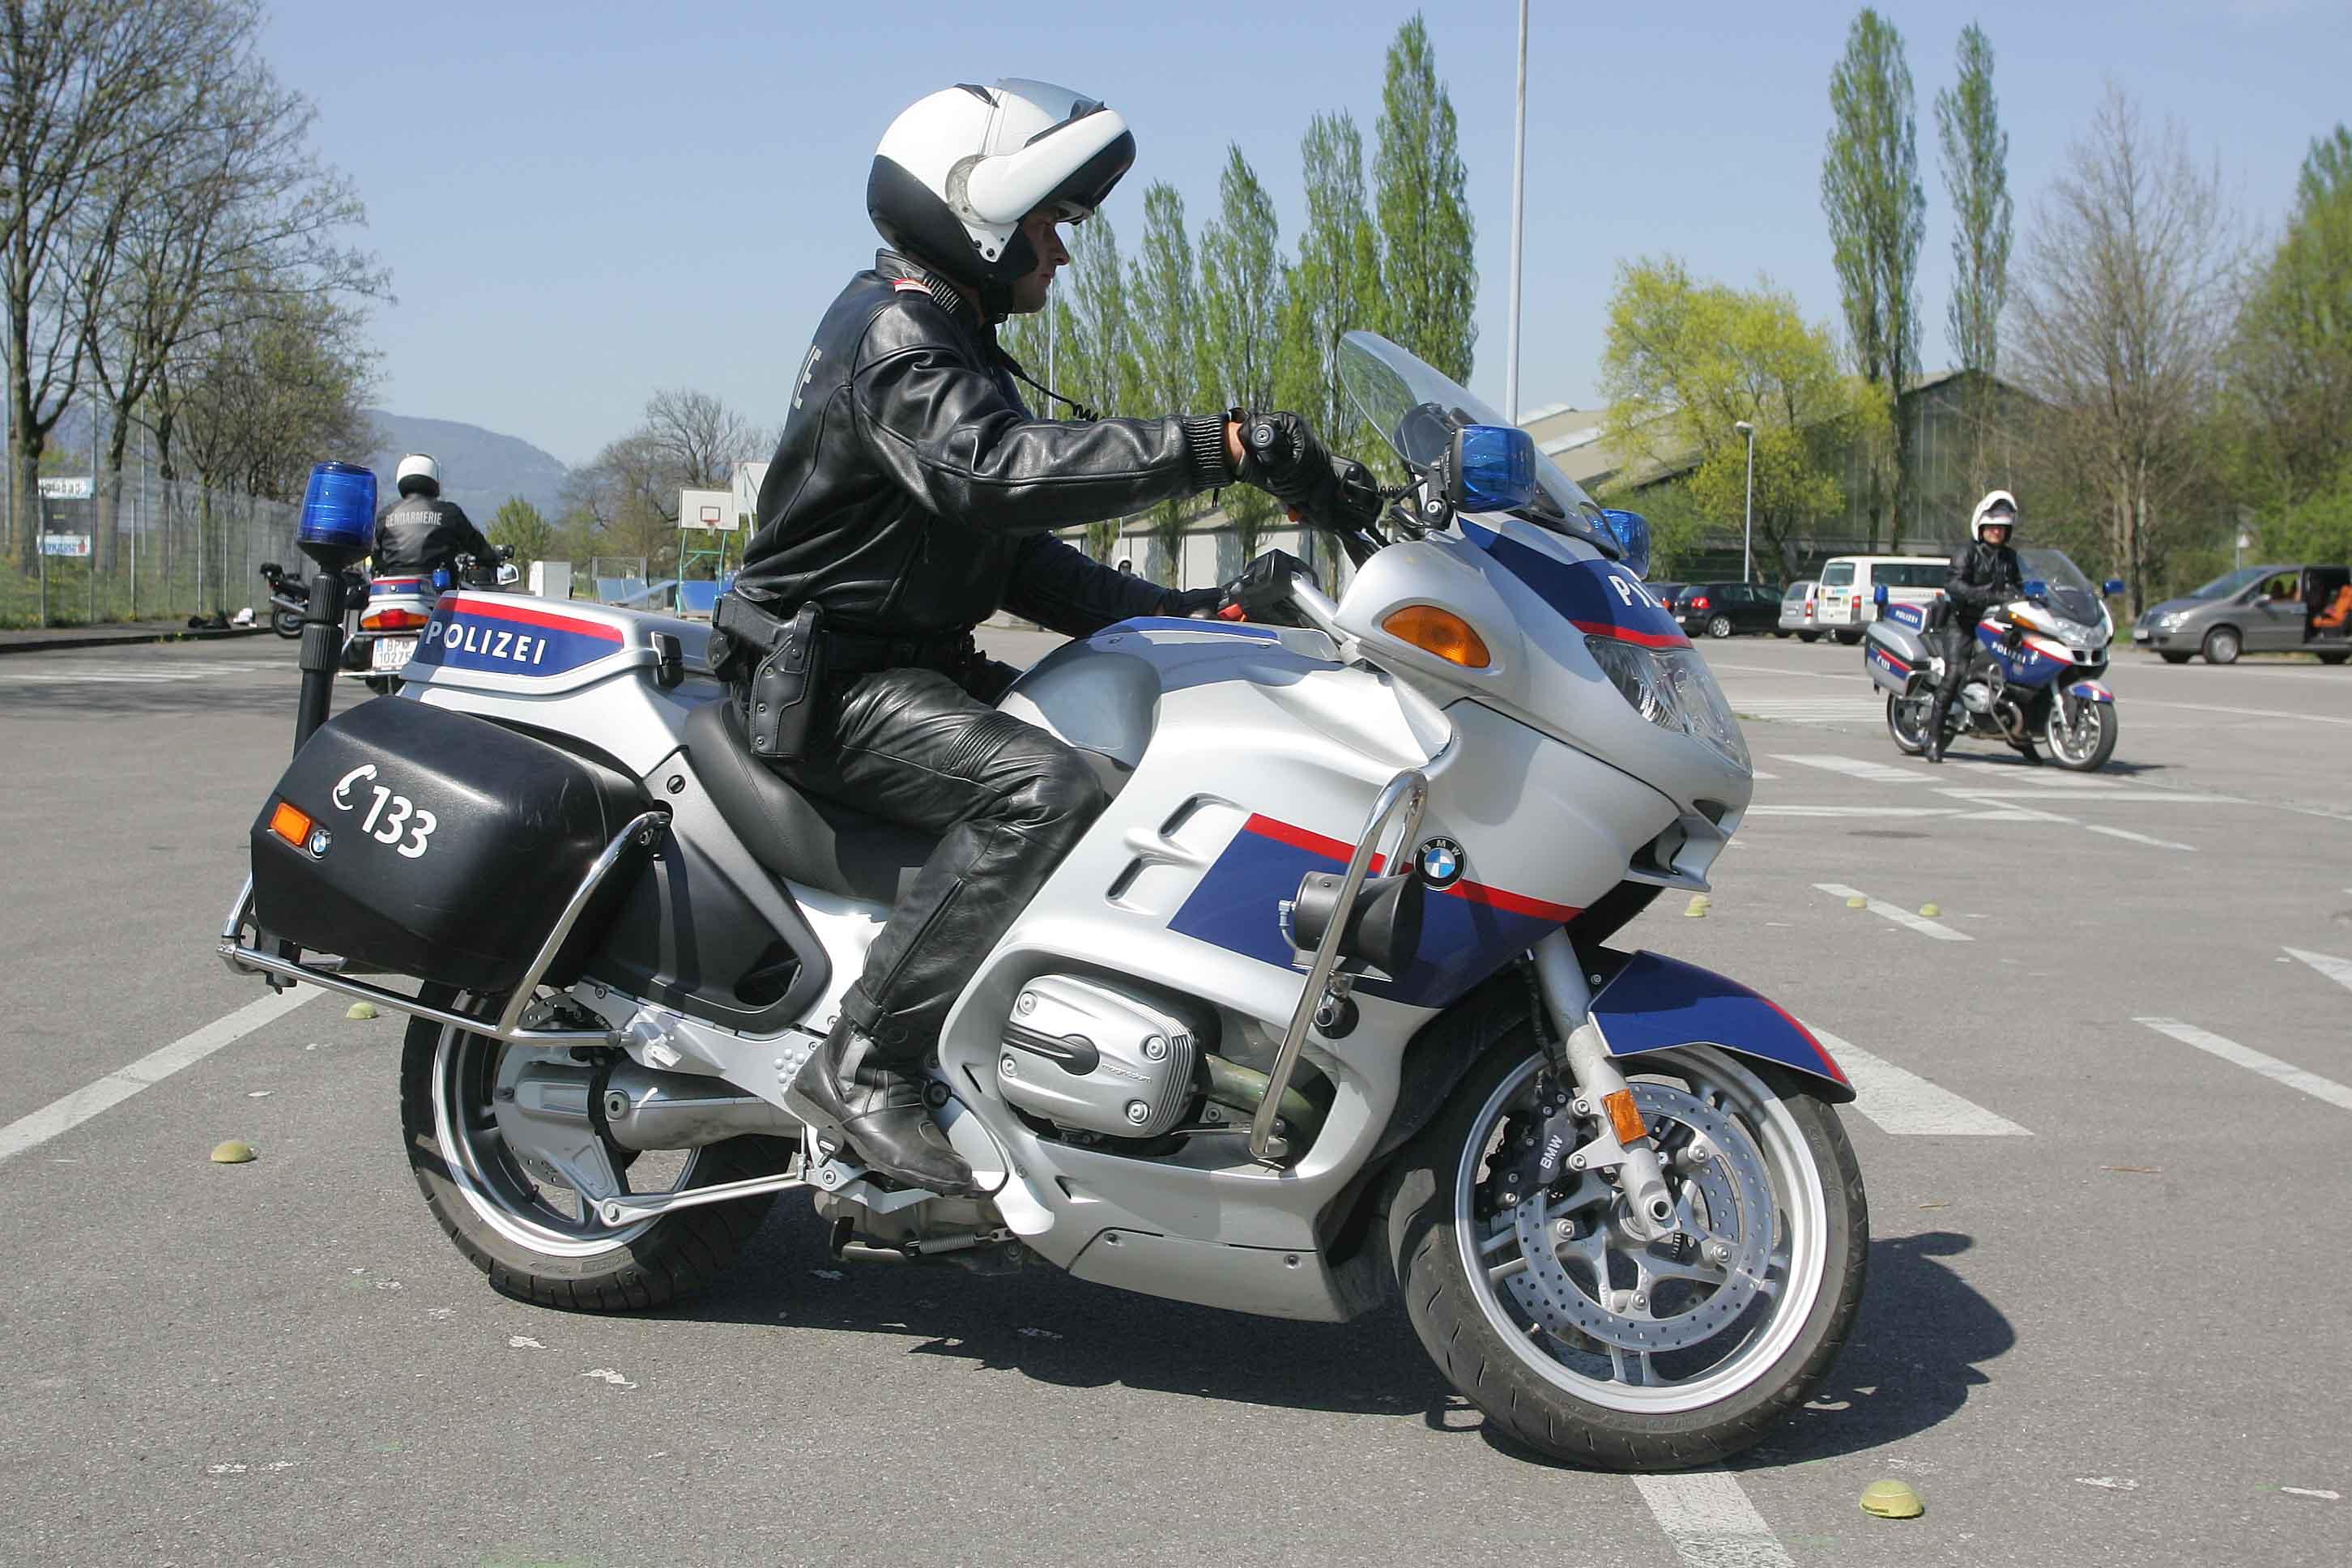 File:Austrian Police Motorcyclist.JPG - Wikimedia Commons